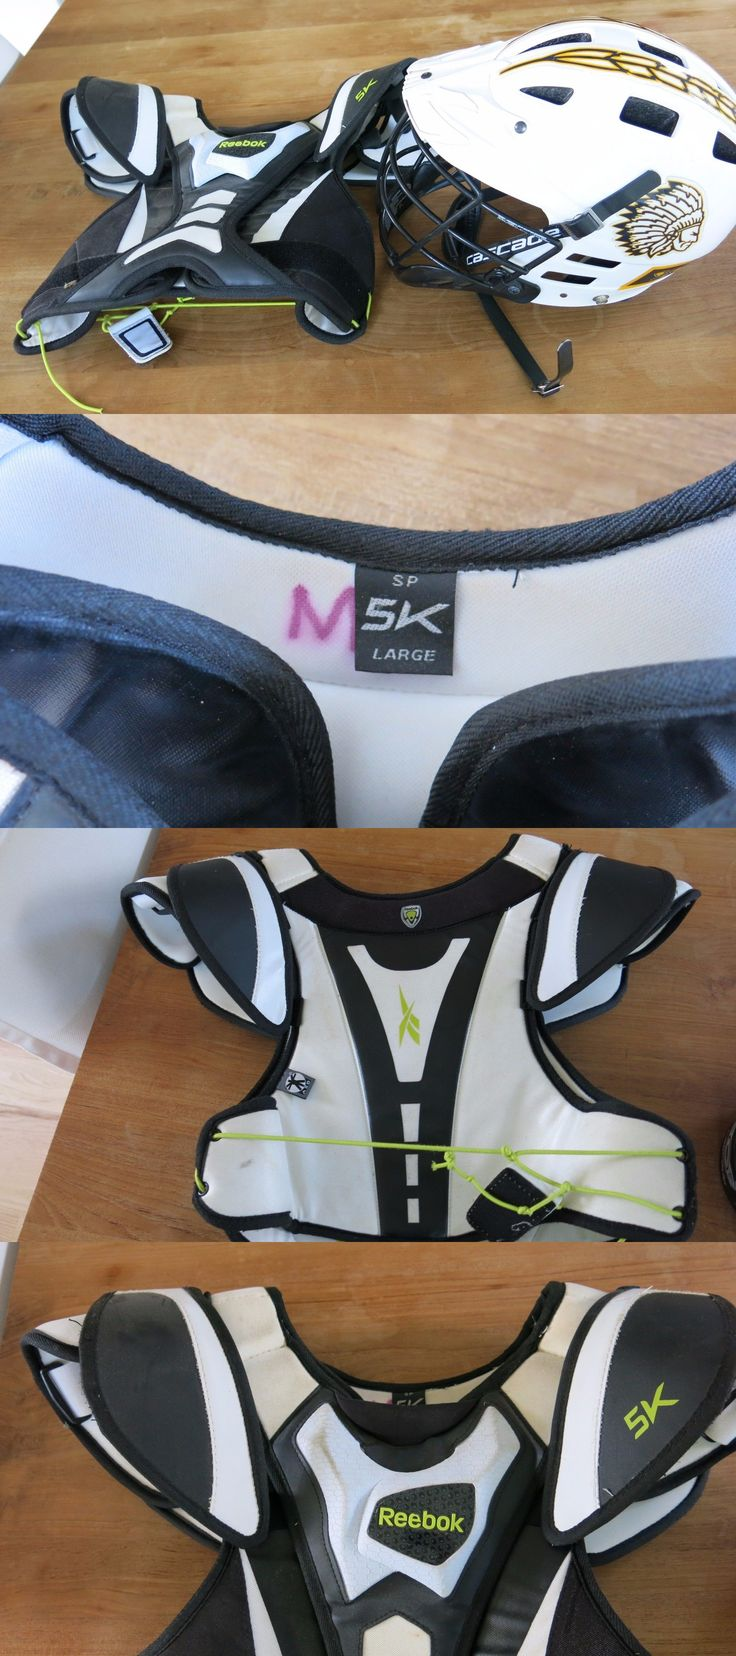 Protective Gear 62164: Boys Kids White Cascade Lacrosse Helmet Small Medium Reebok Shoulder Pads -> BUY IT NOW ONLY: $39.99 on eBay!